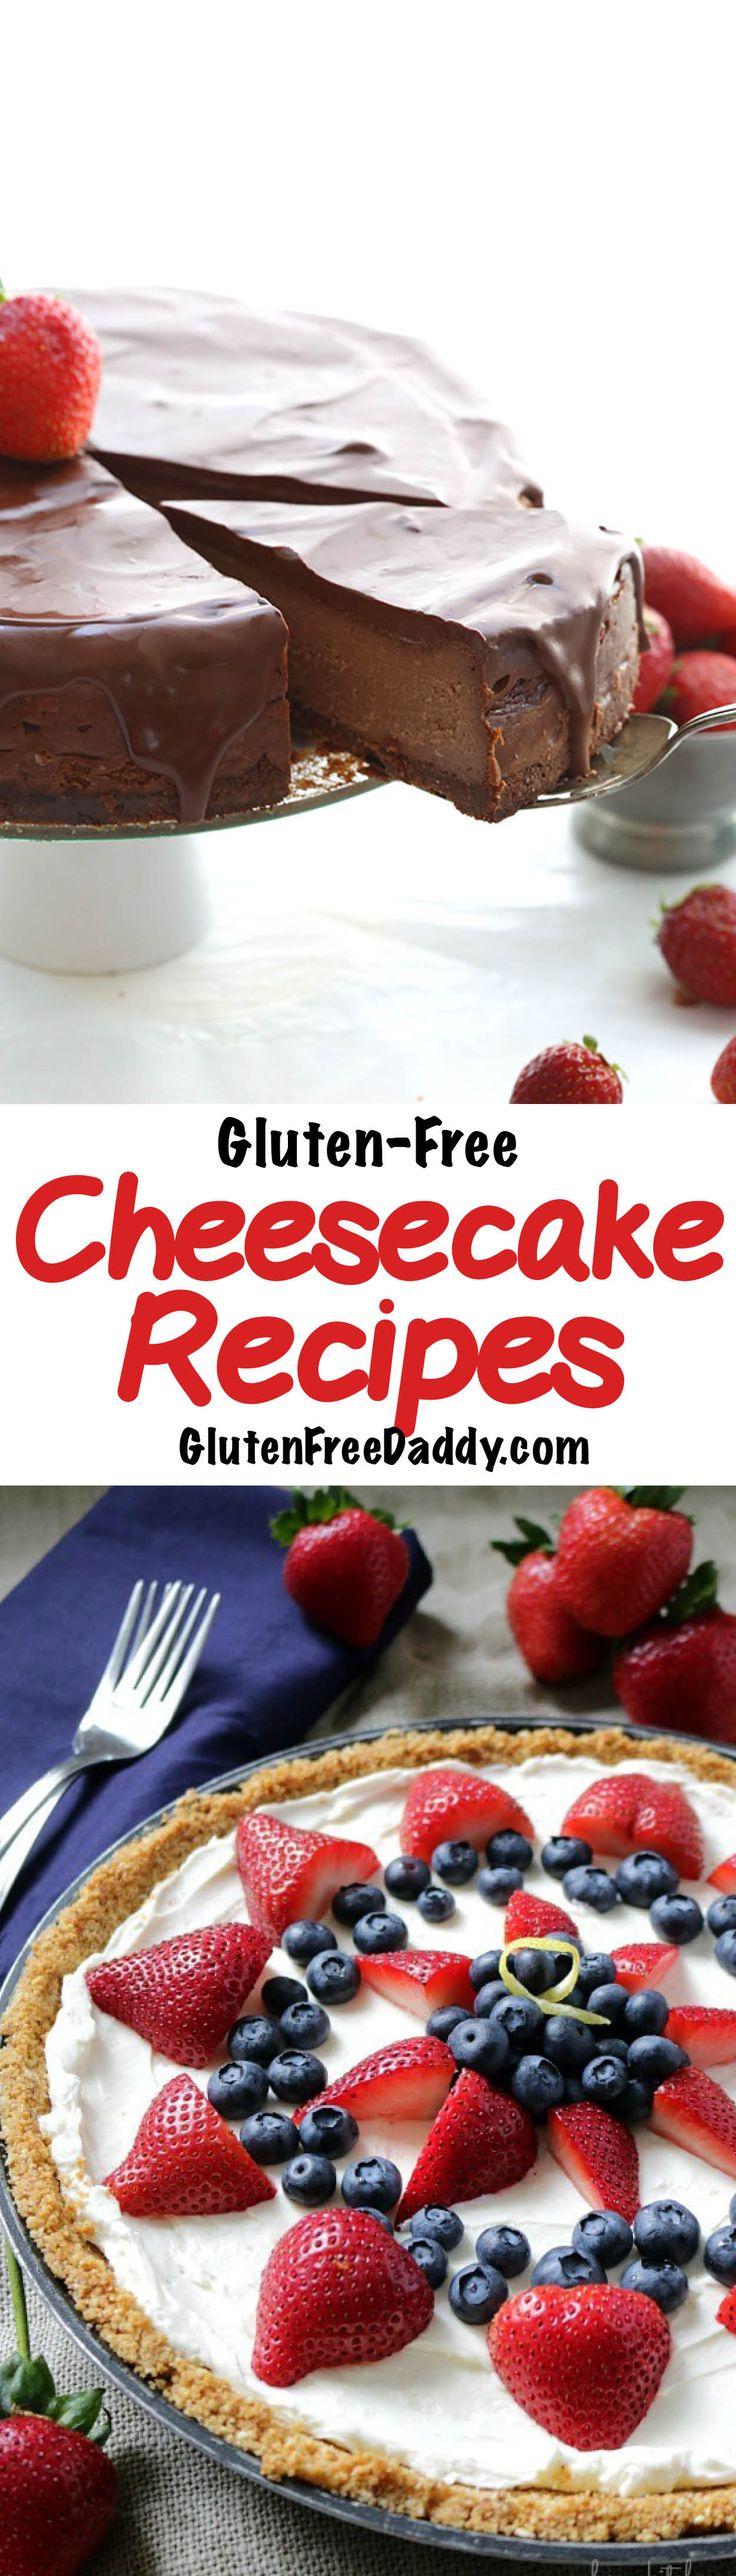 The 25 Best Gluten-Free Cheesecake Recipes